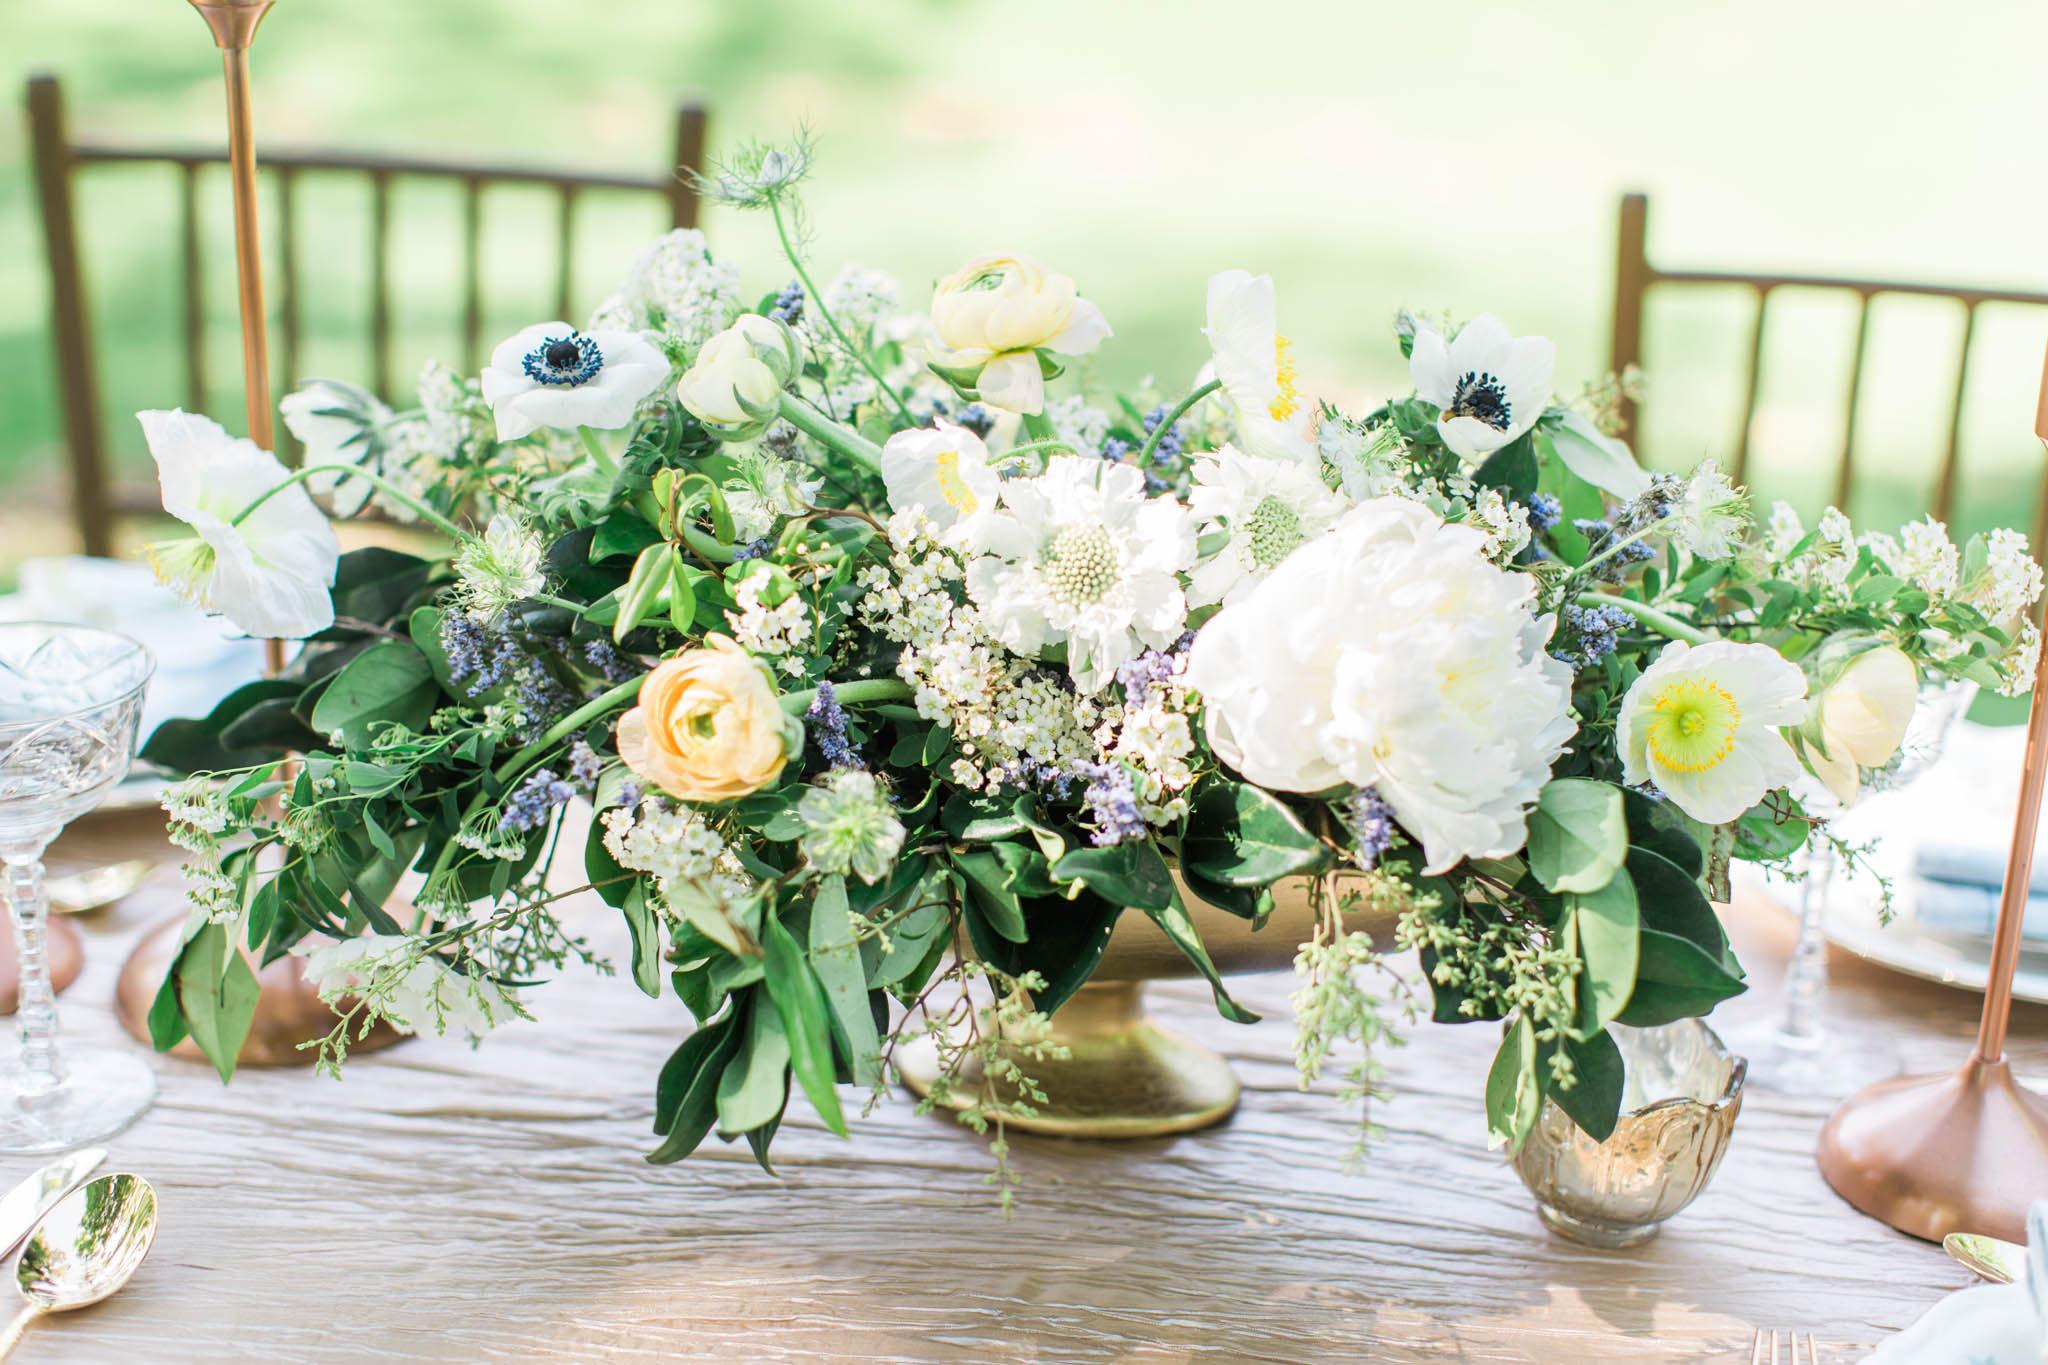 dallas wedding flowers - wedding florist in dallas